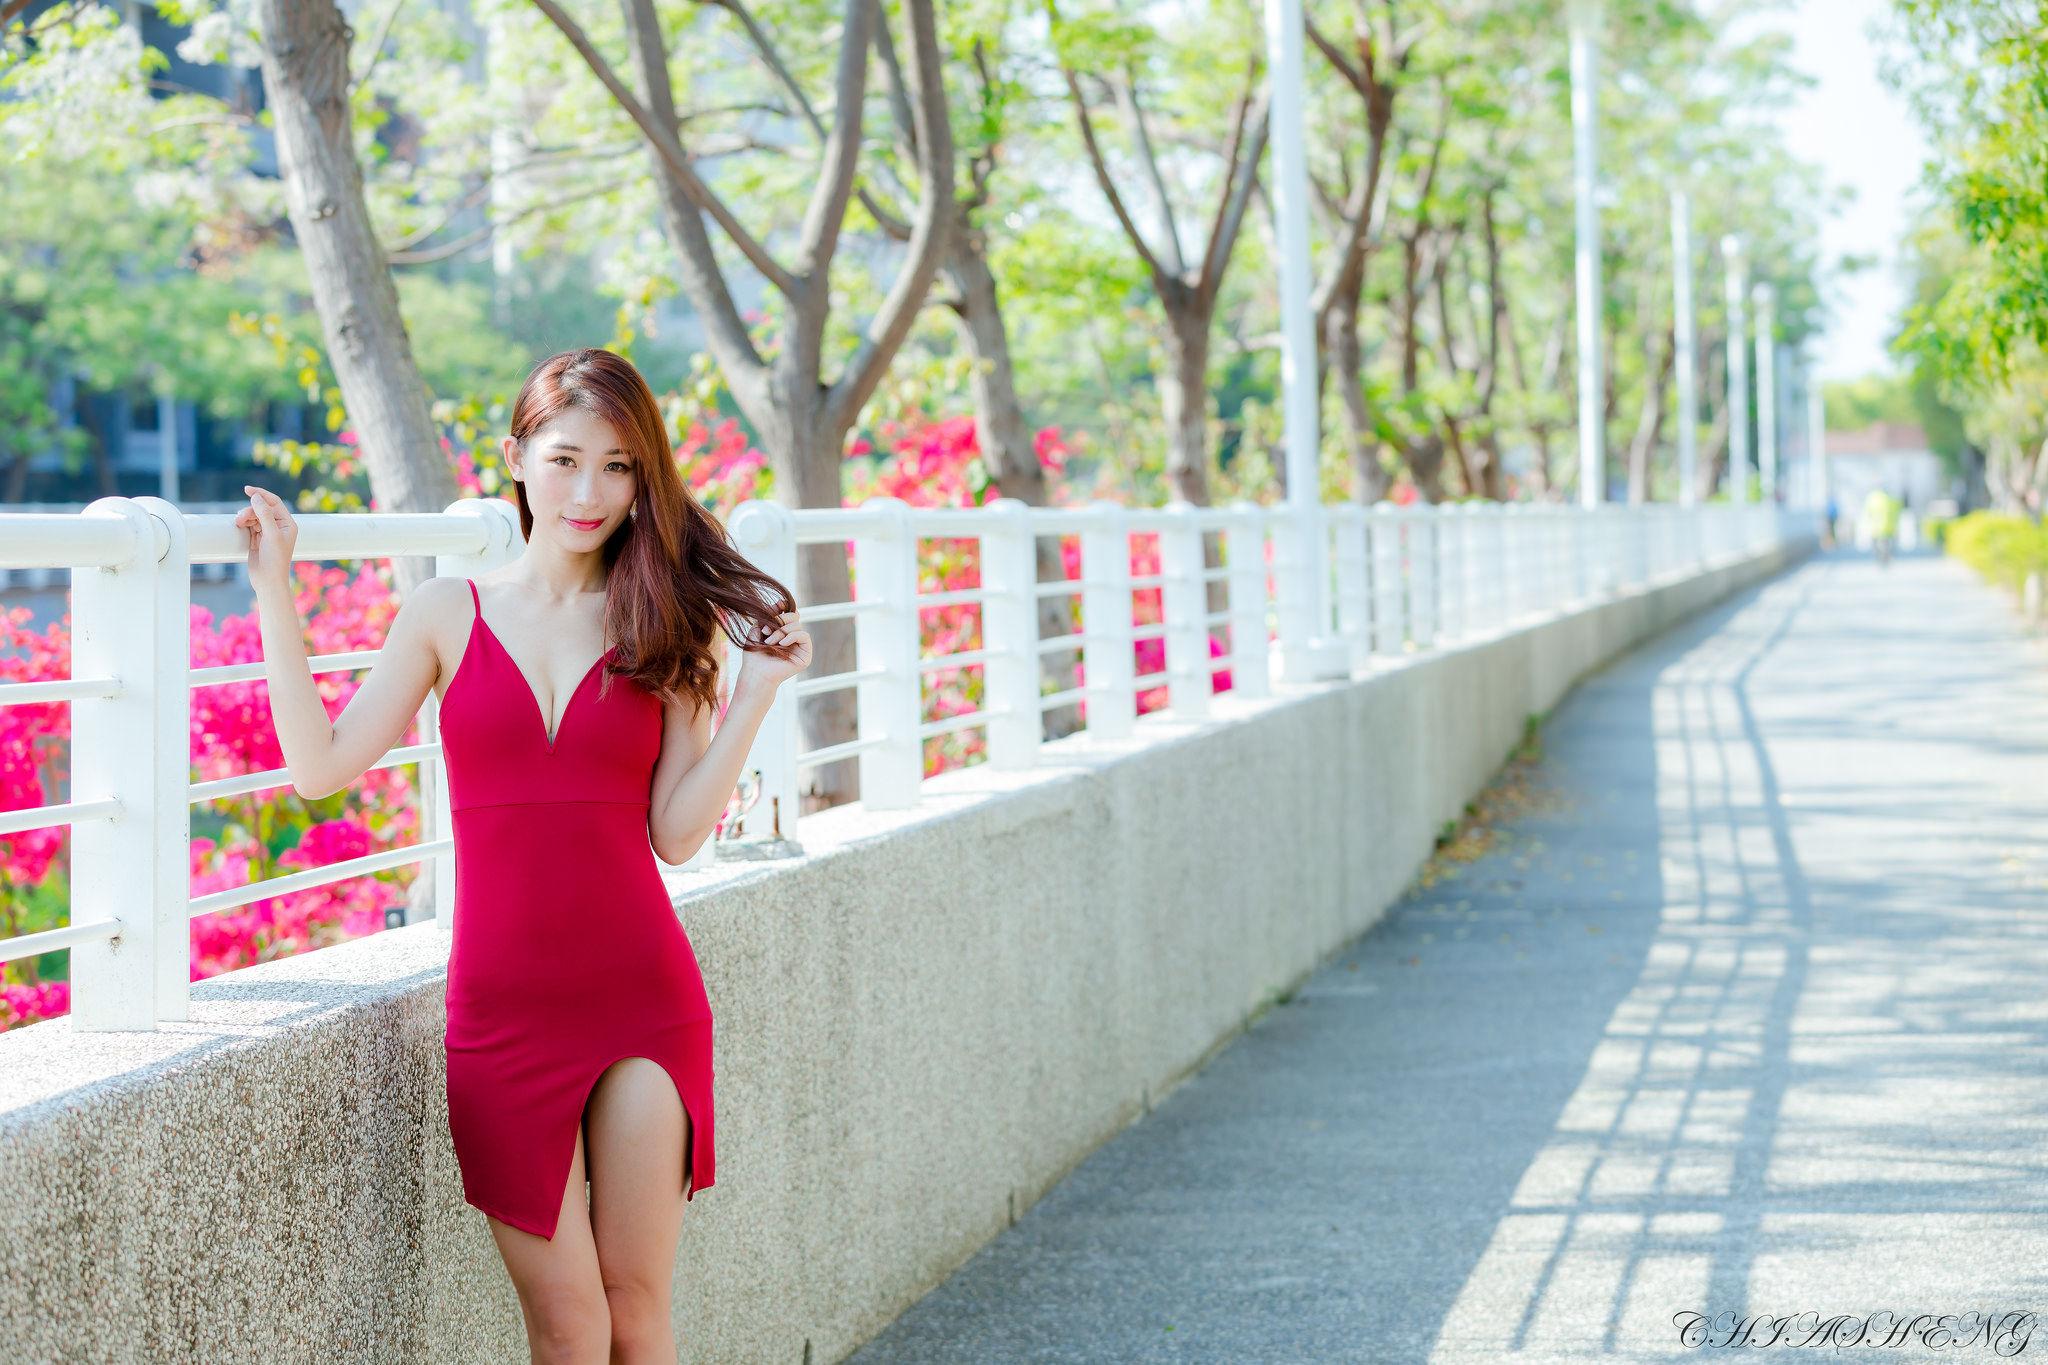 VOL.150 [台湾正妹]御姐街拍优雅美女街拍美臀:小雨超高清个人性感漂亮大图(36P)